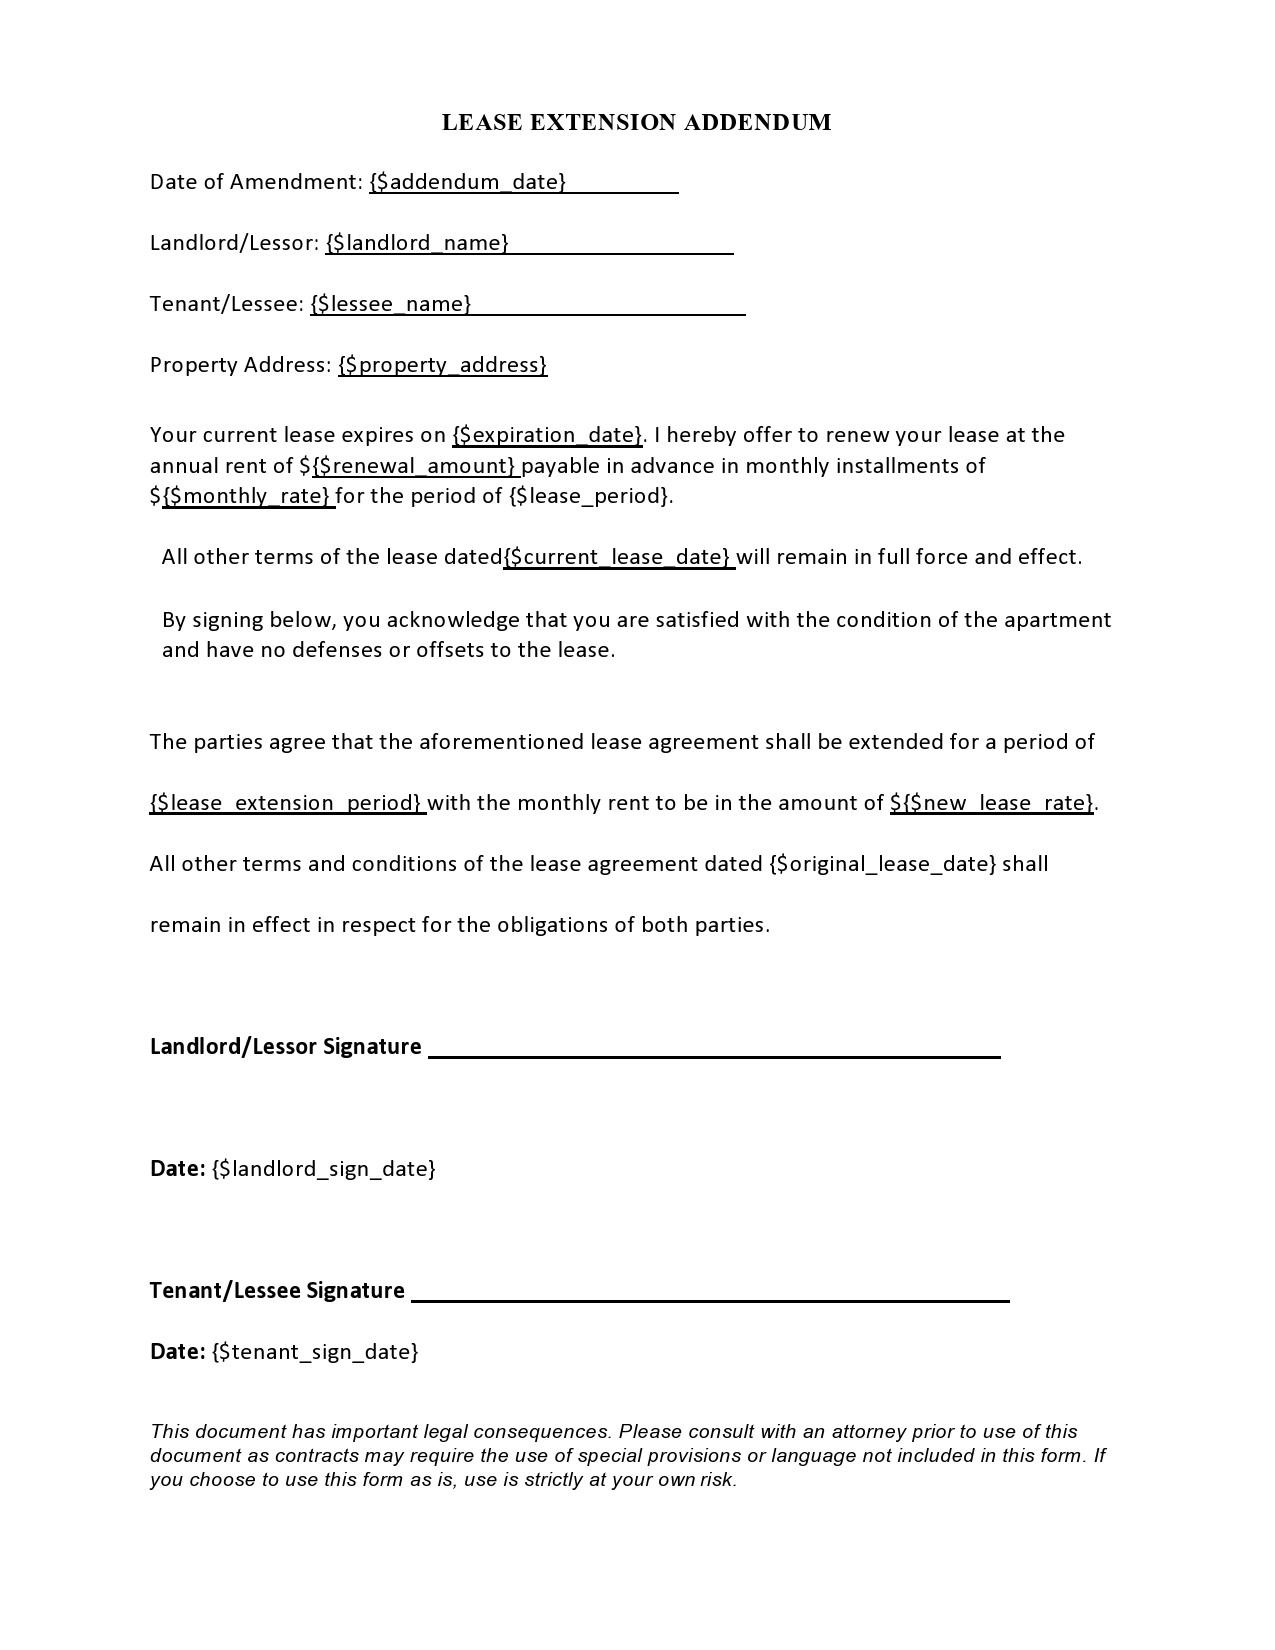 Free lease extension addendum 11